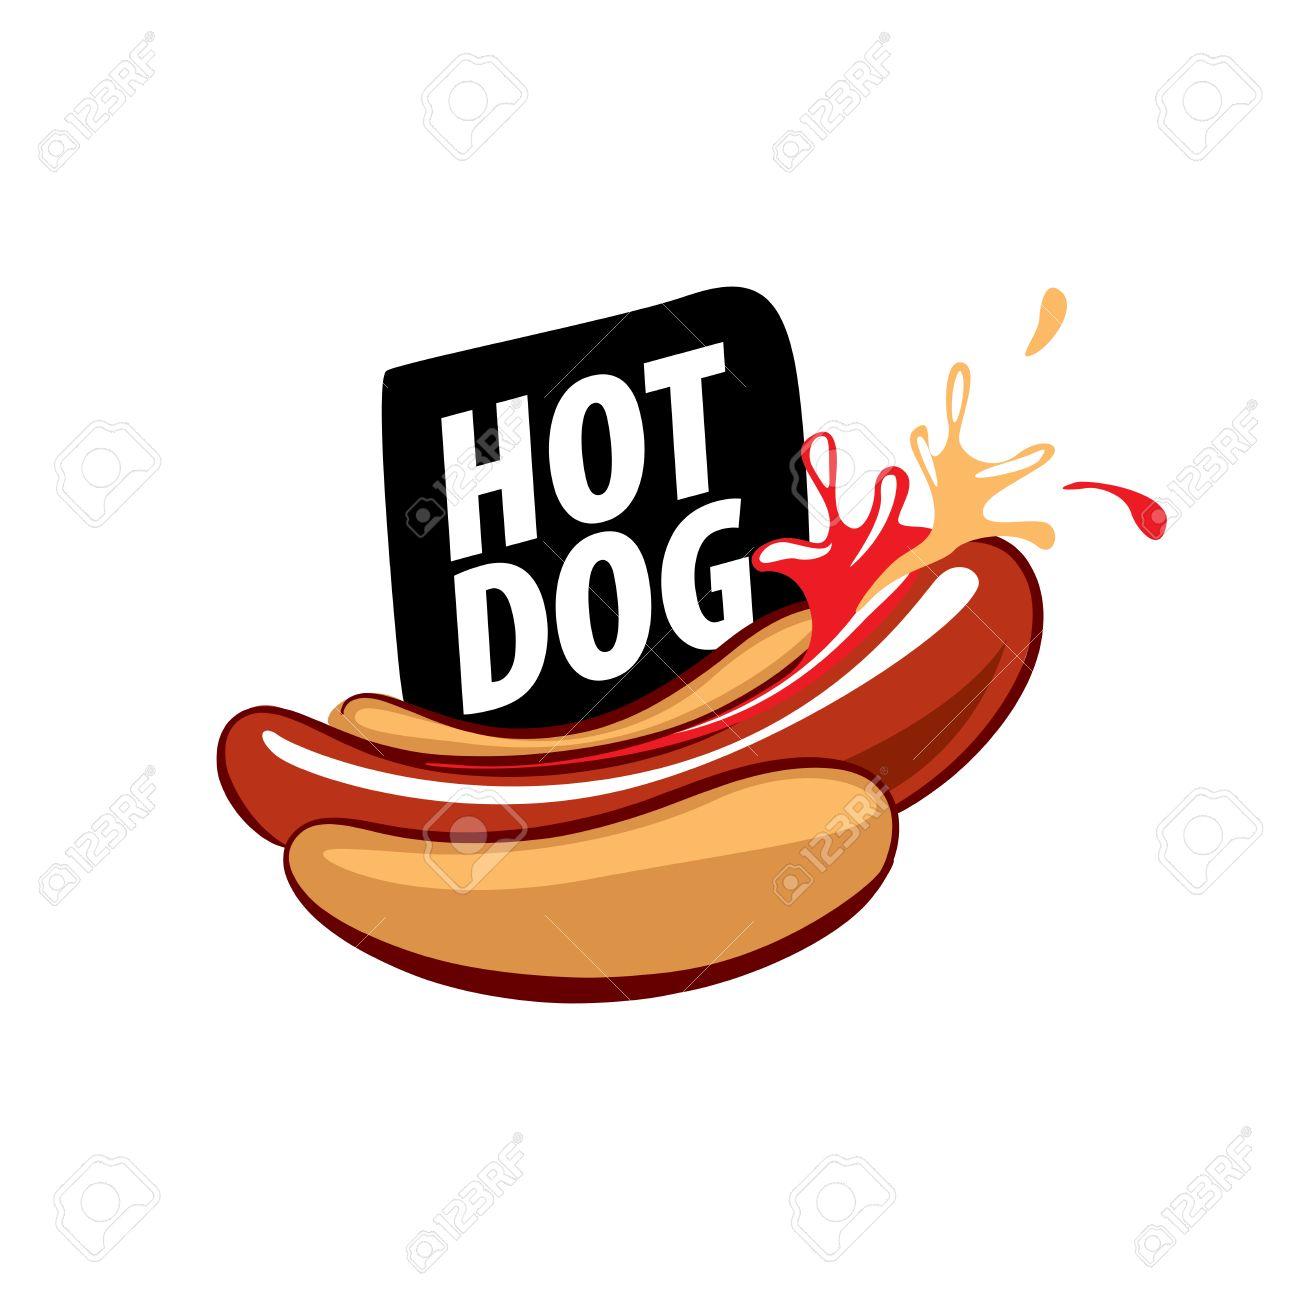 vector logo hot dog royalty free cliparts vectors and stock rh 123rf com hot dog lego hot dog lego